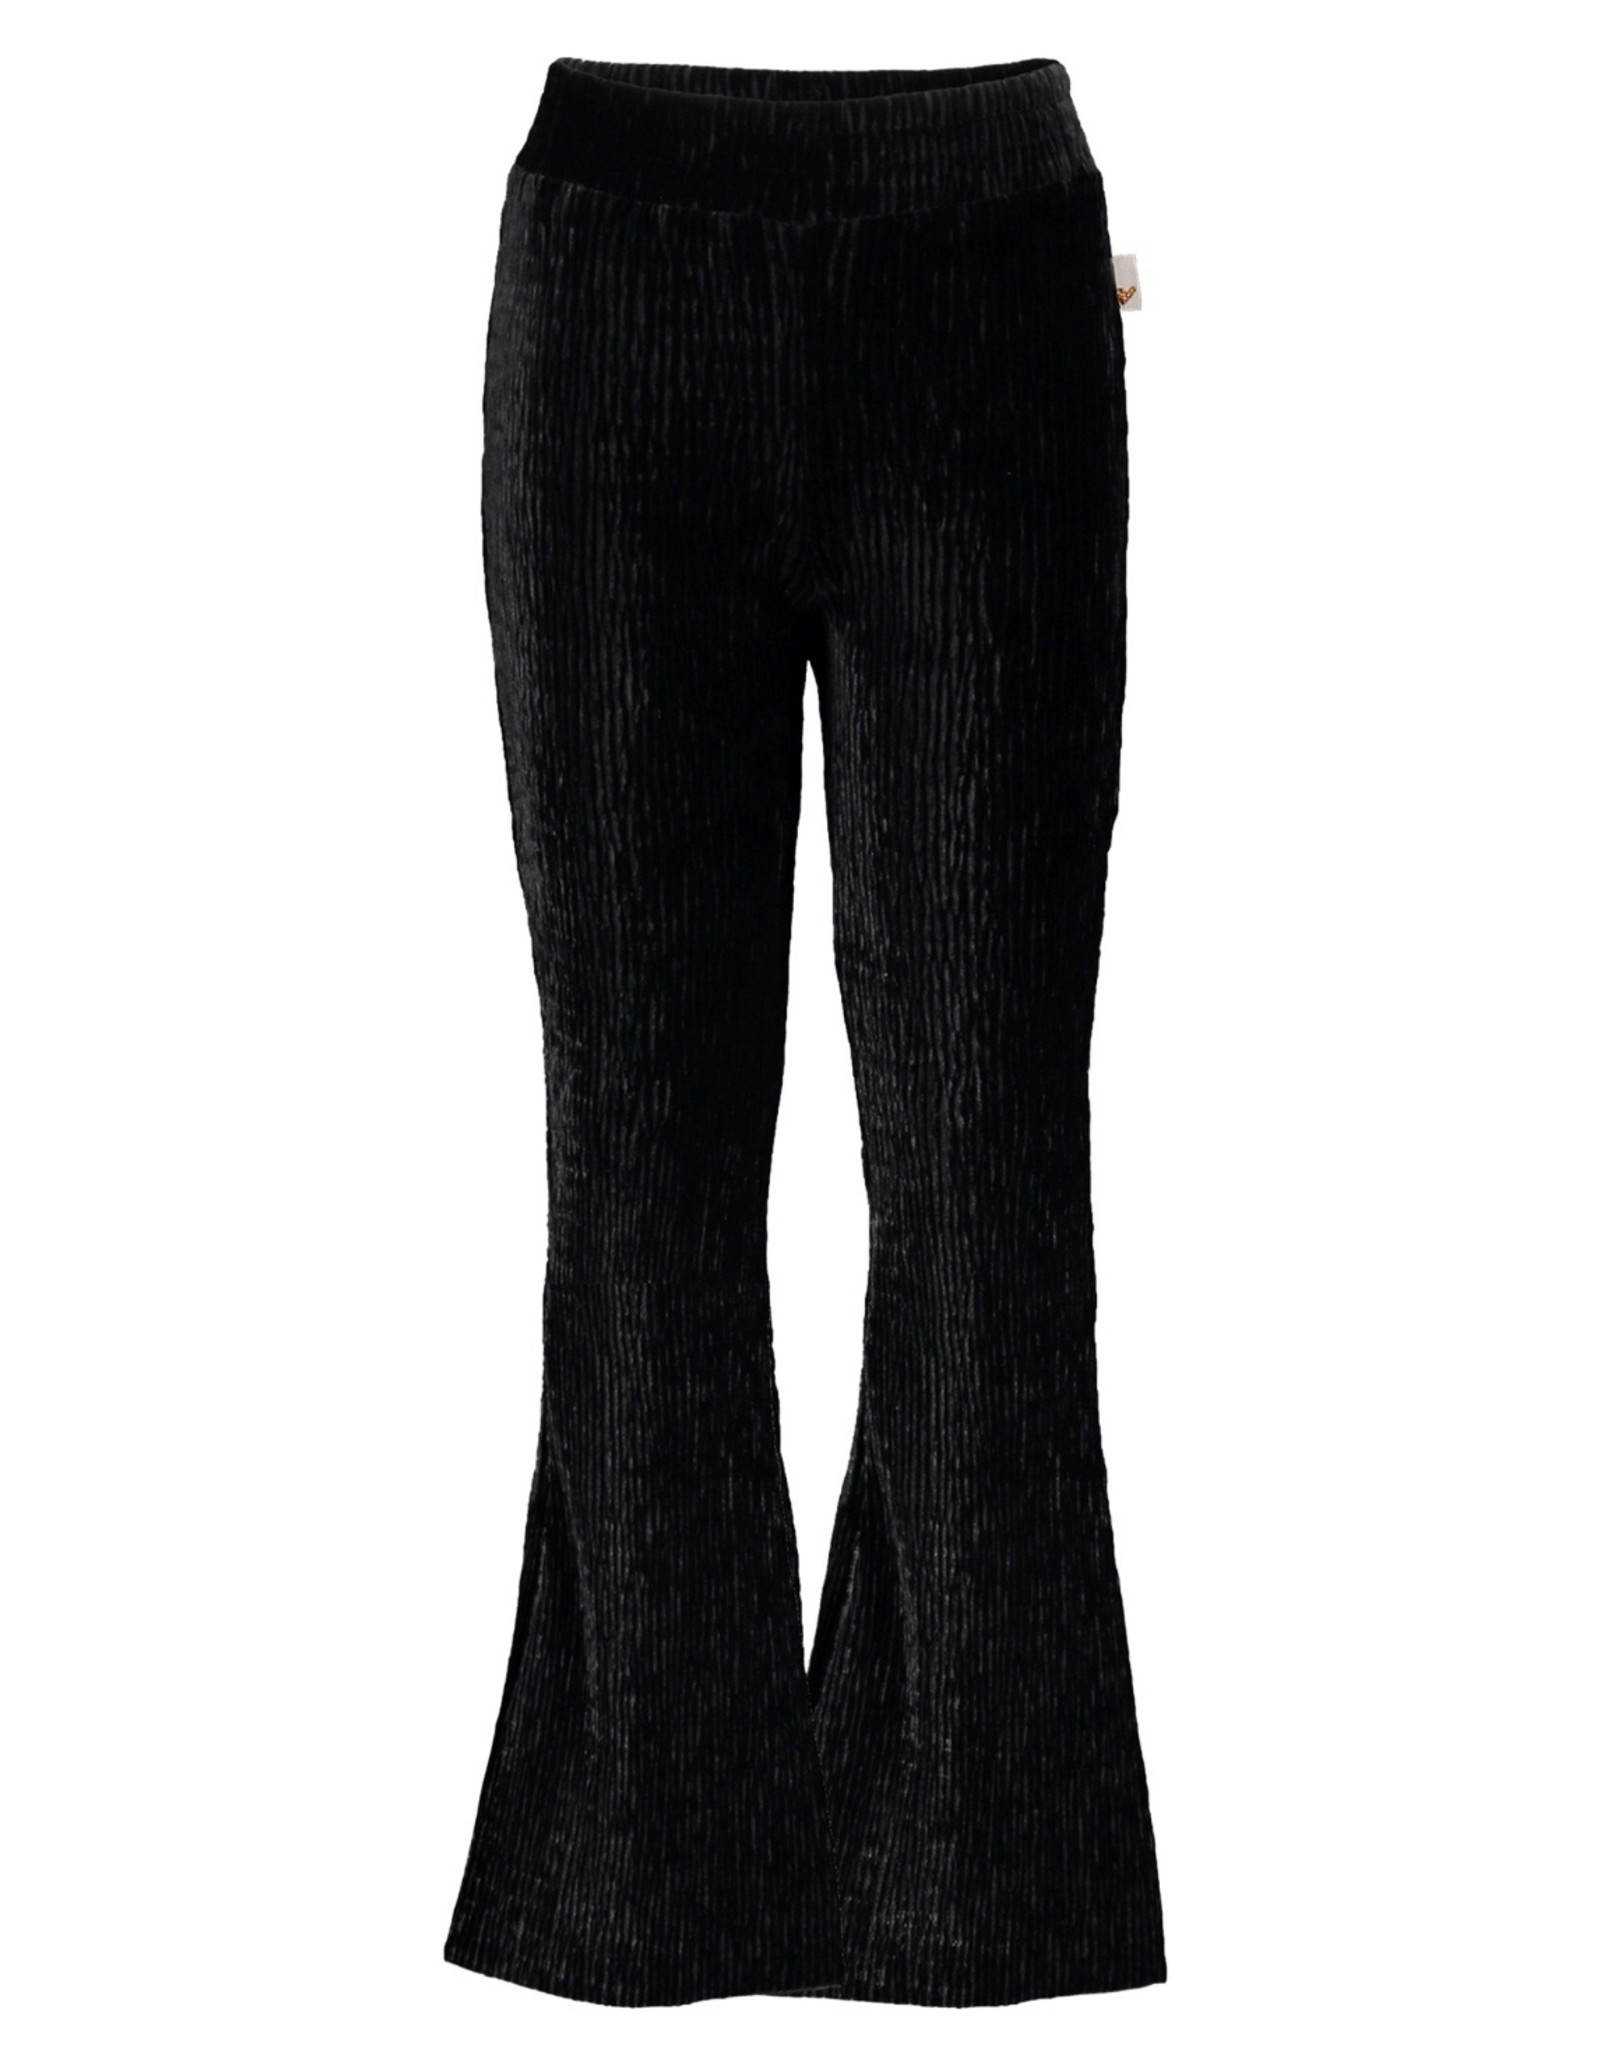 moodstreet M108-5611 Flared pants